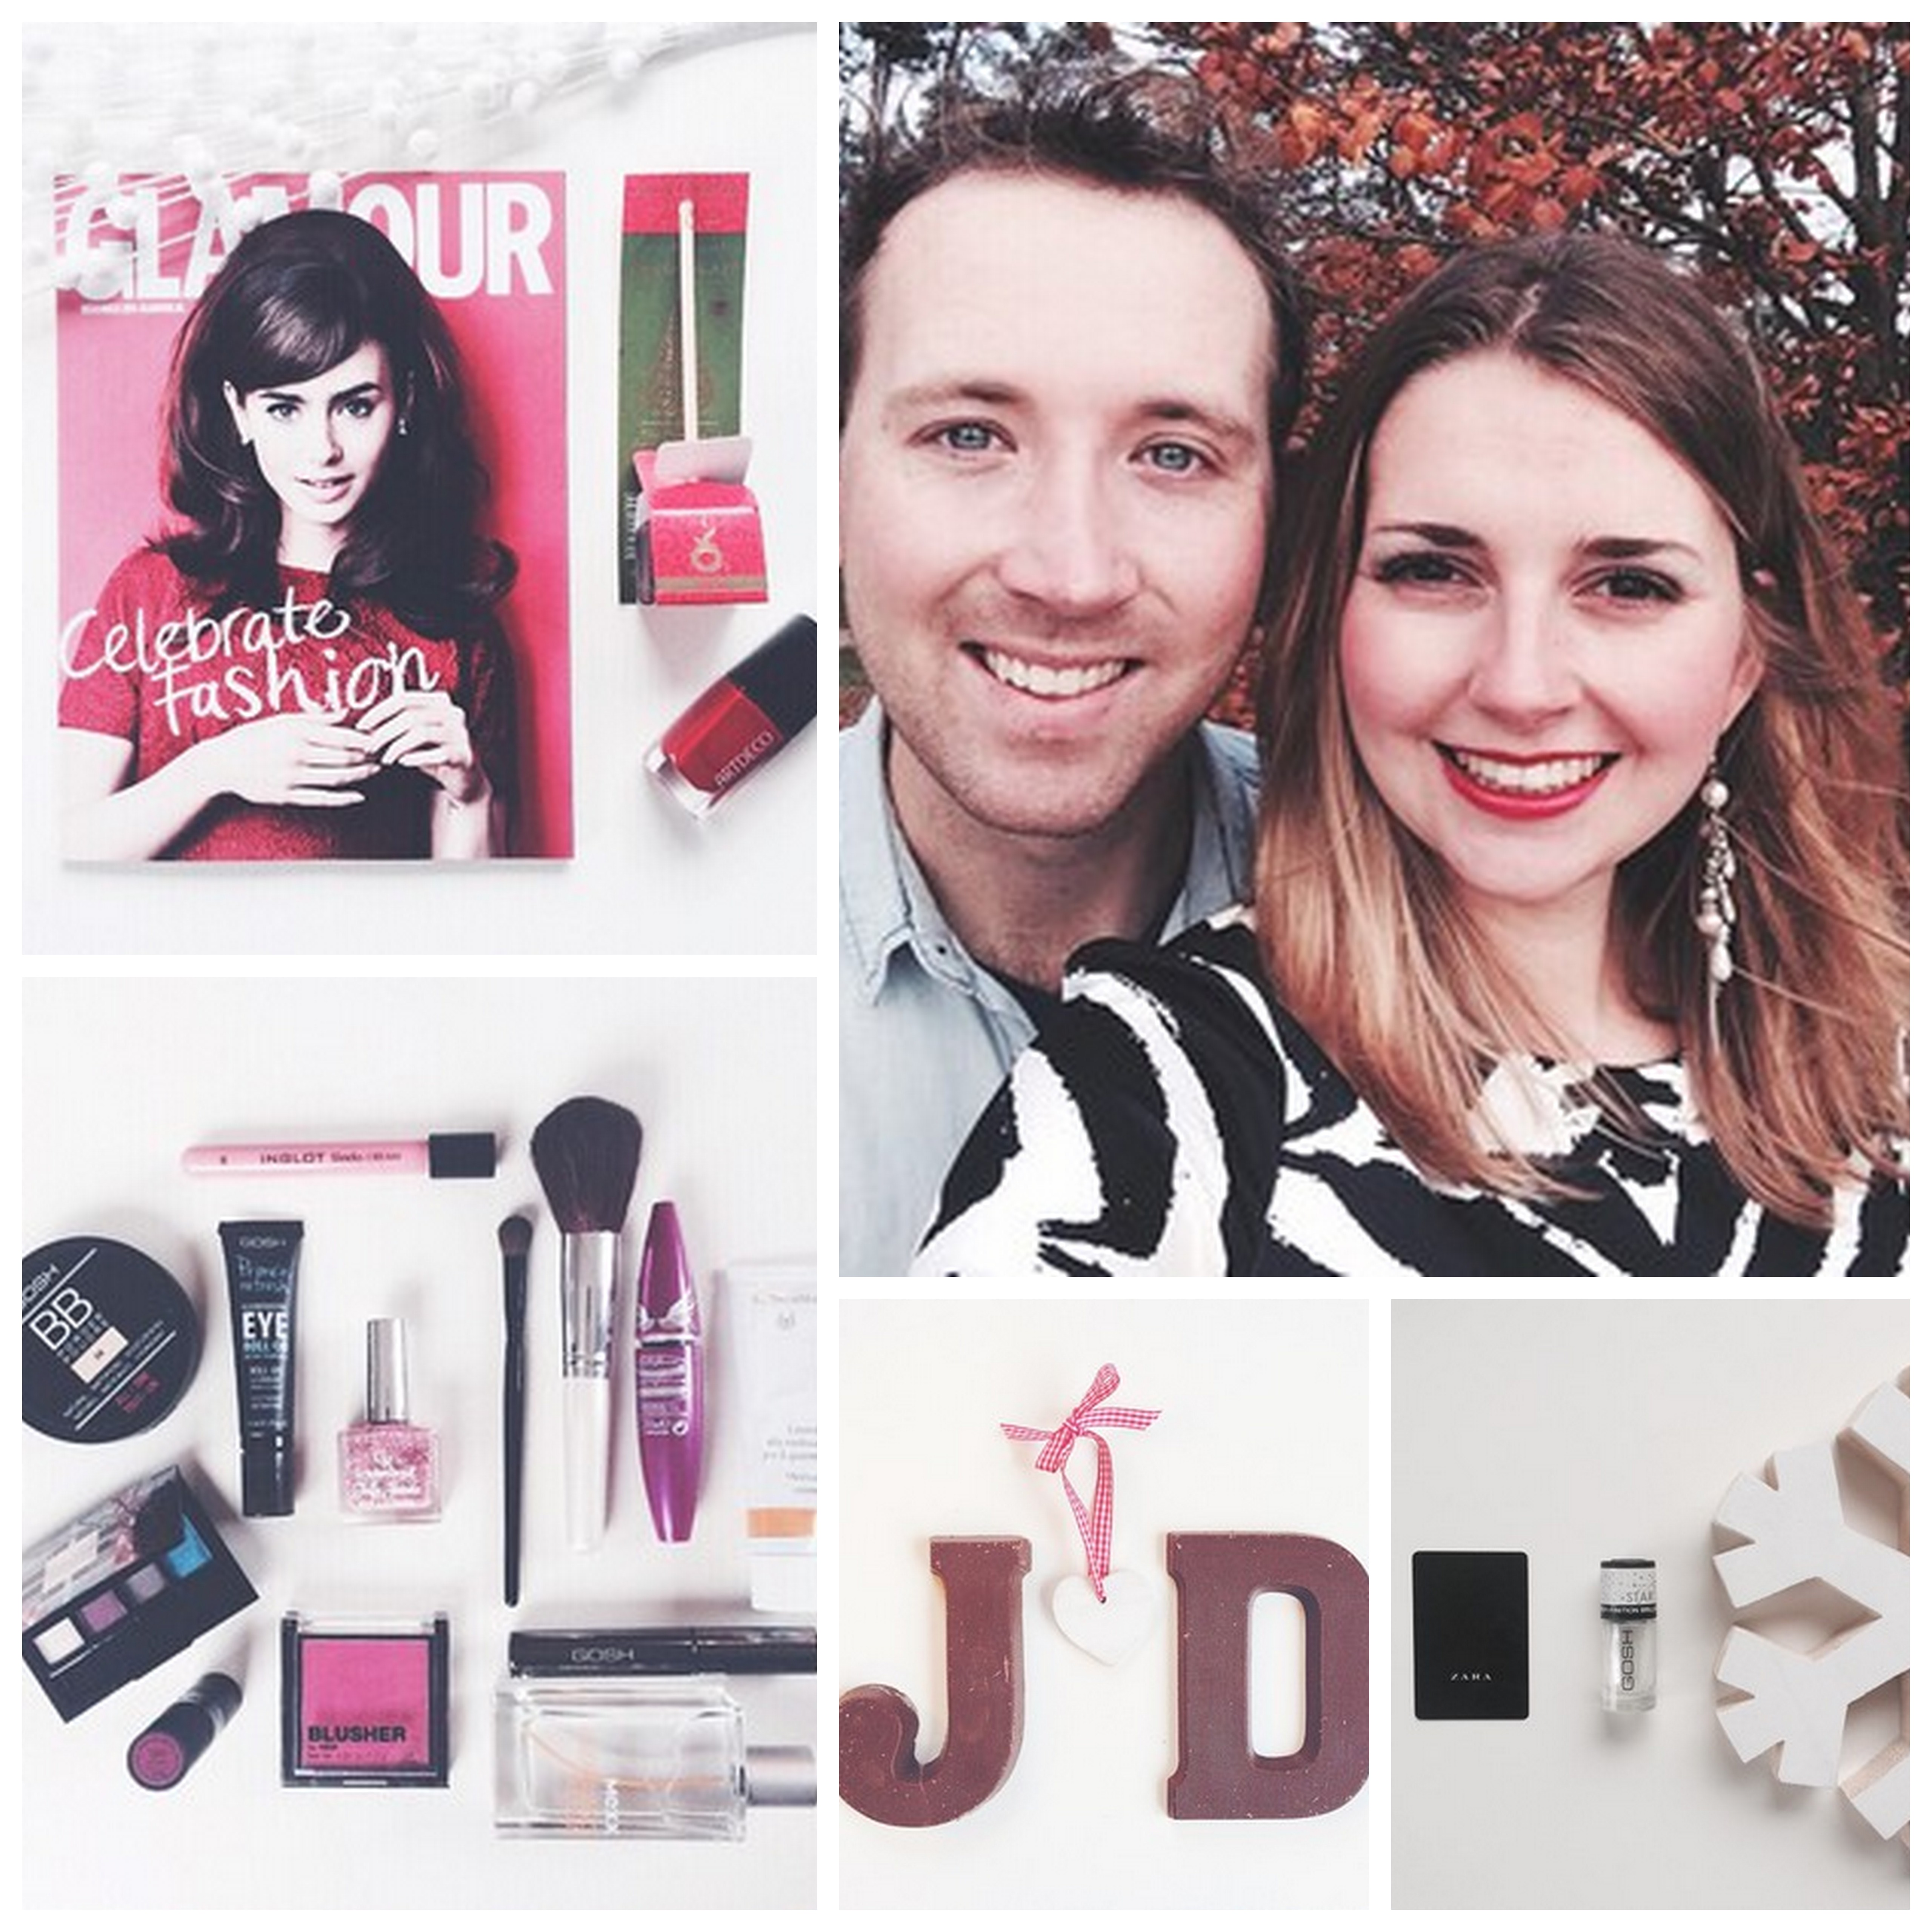 Behind the scenes #65 – Shoppen, me-time en liefde